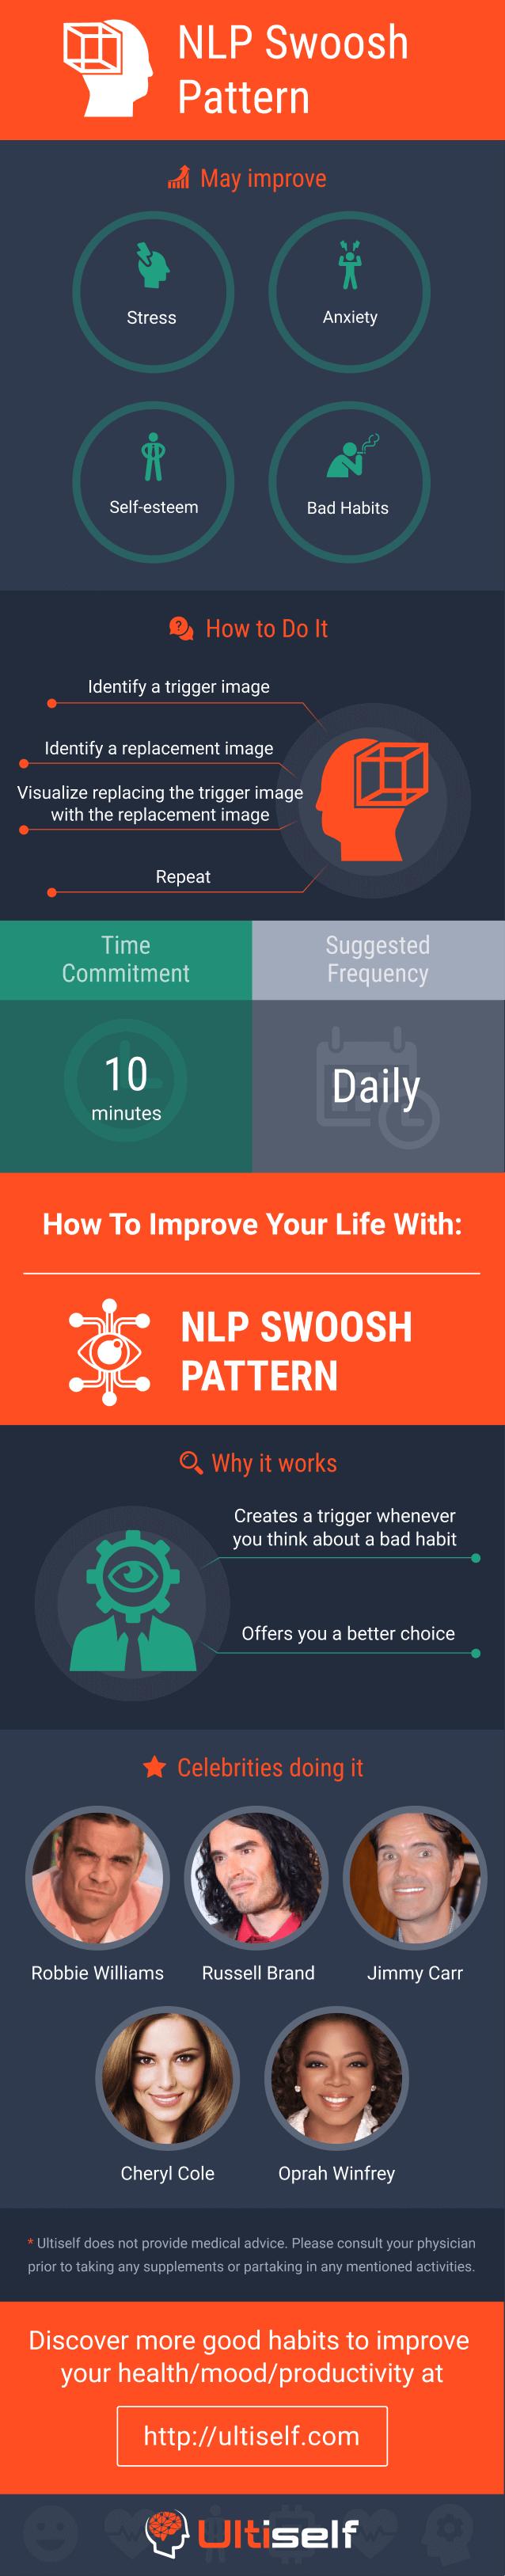 NLP Swoosh Pattern infographic